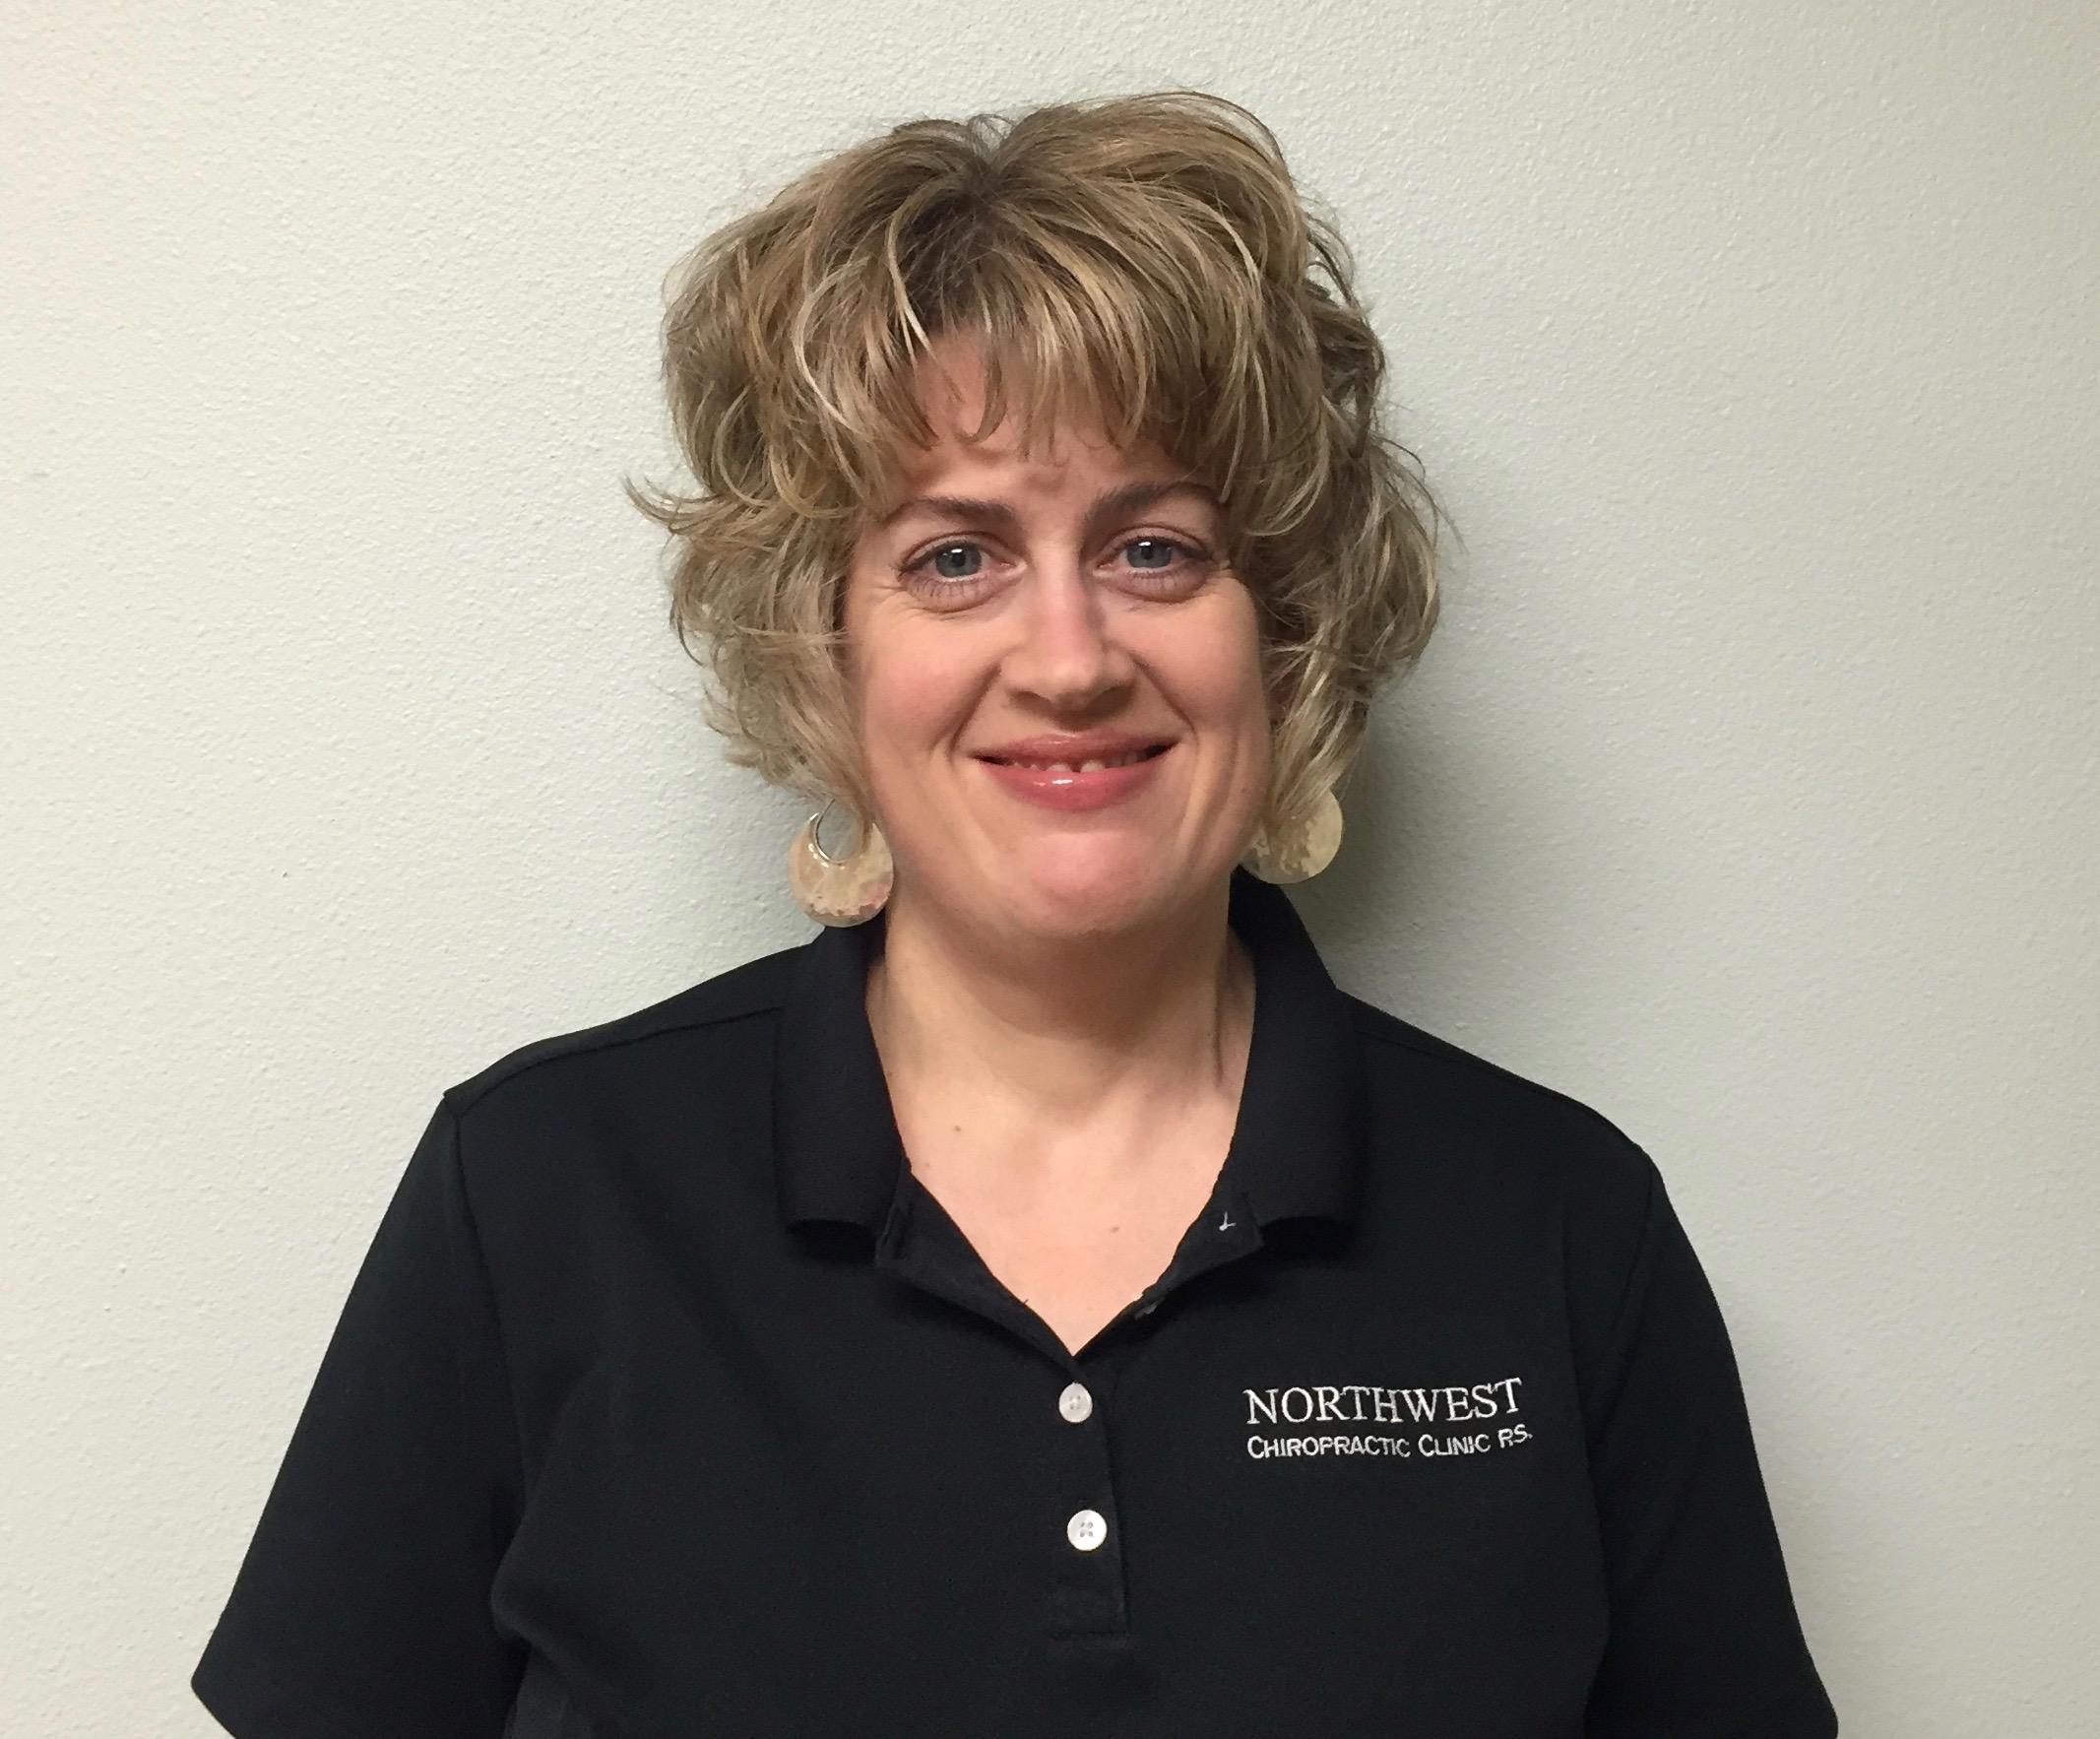 Denise Howard - Northwest Chiropractic Clinic